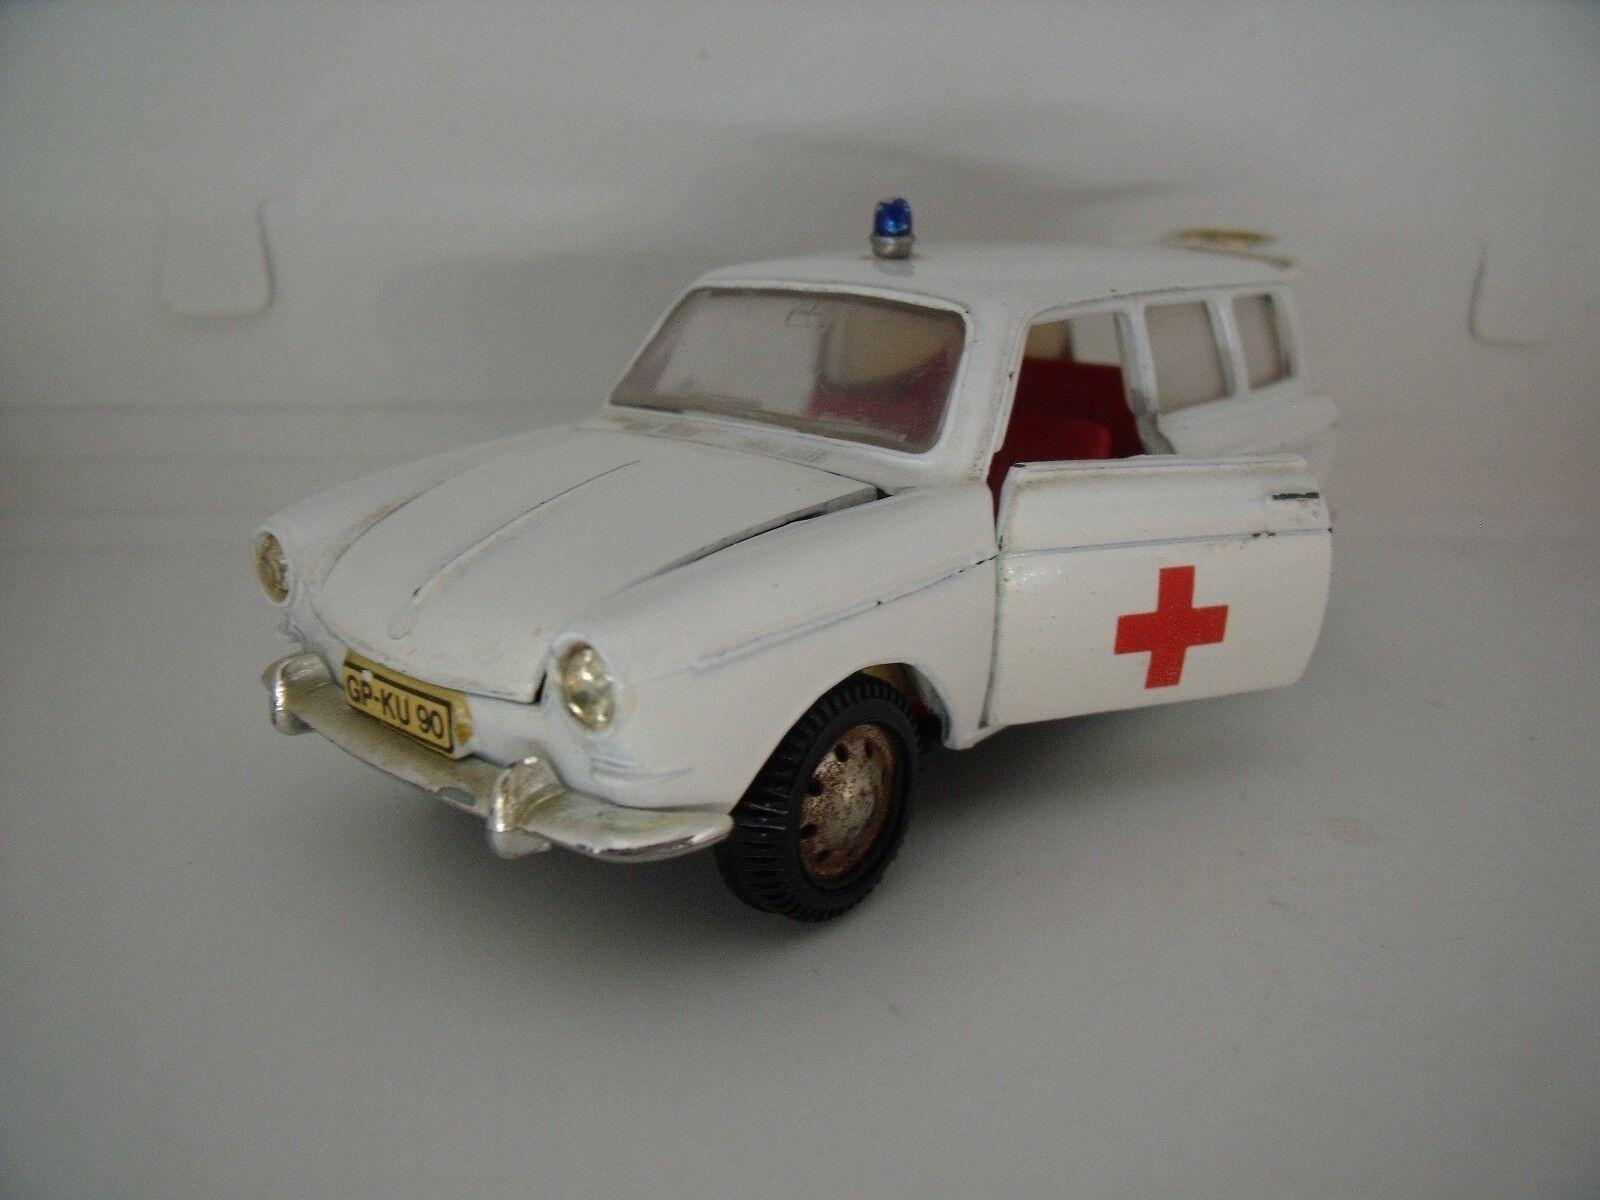 VW VOLKSWAGEN VARIANT 1600 L AMBULANCE  MARKLIN JOLIE NICE TOP